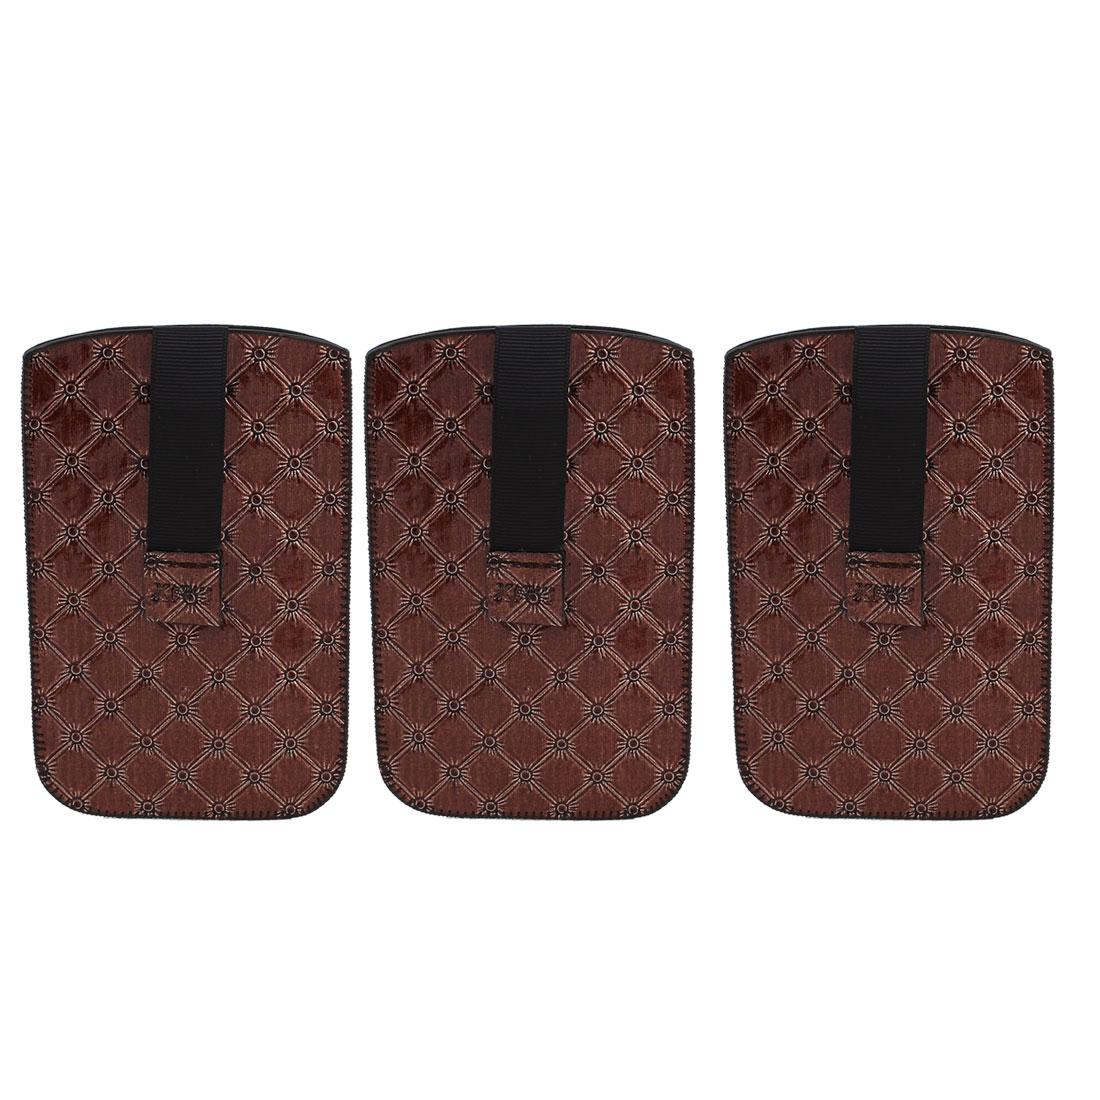 3 Pcs Brown Protective Vertical Bag Holder Case for Mobile Phone